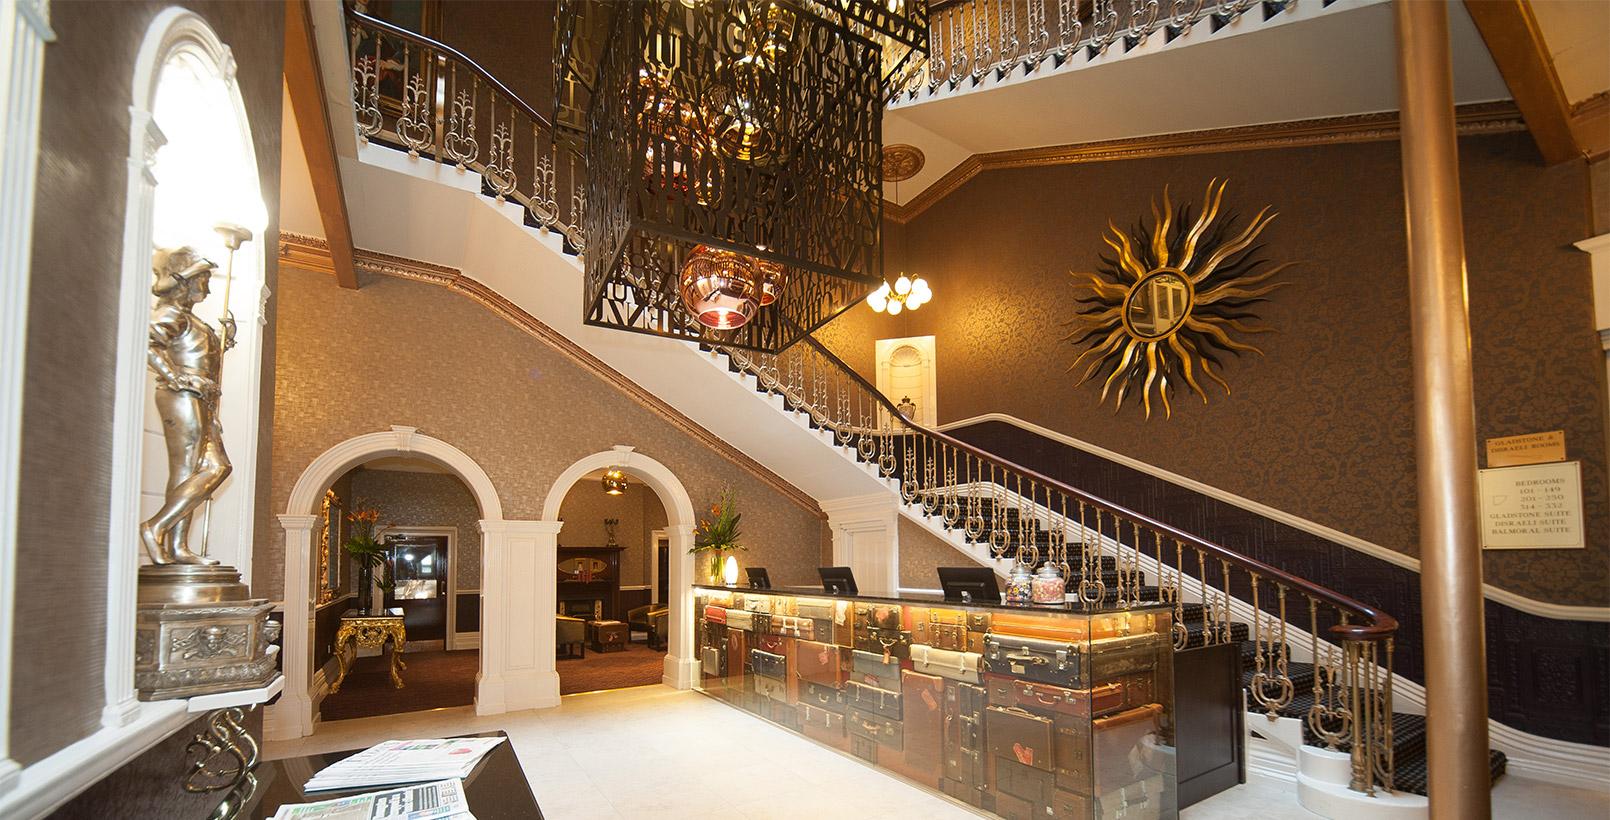 Hallmark Hotel Chester The Queen  Bw Premier Collection